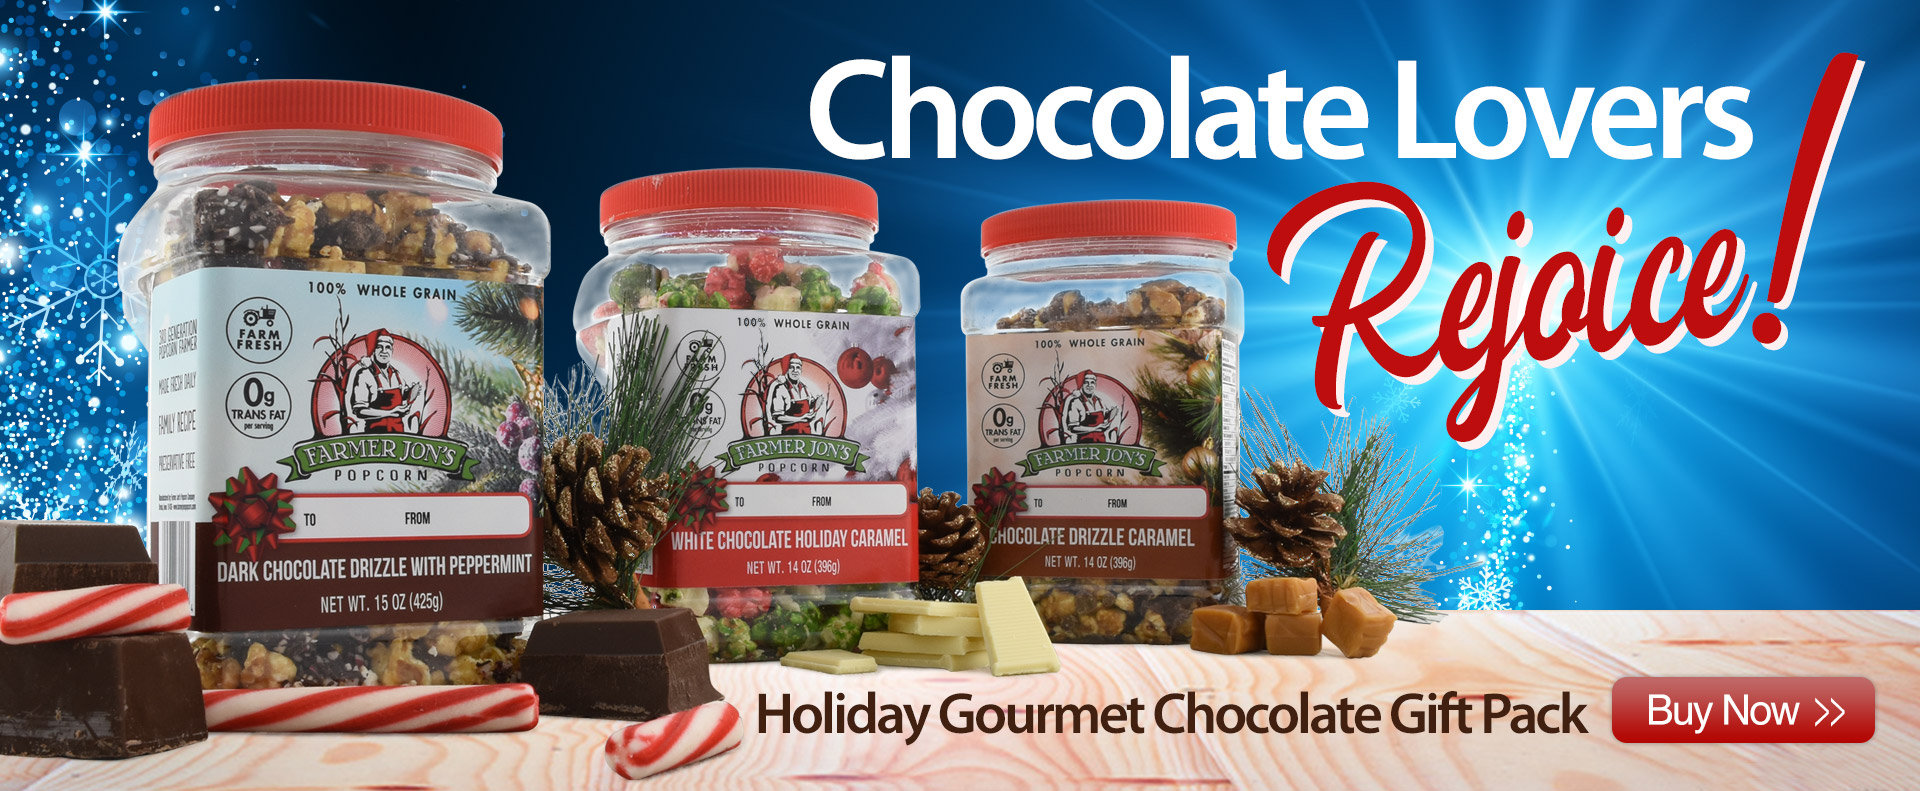 Chocolate-Lovers-Rejoice